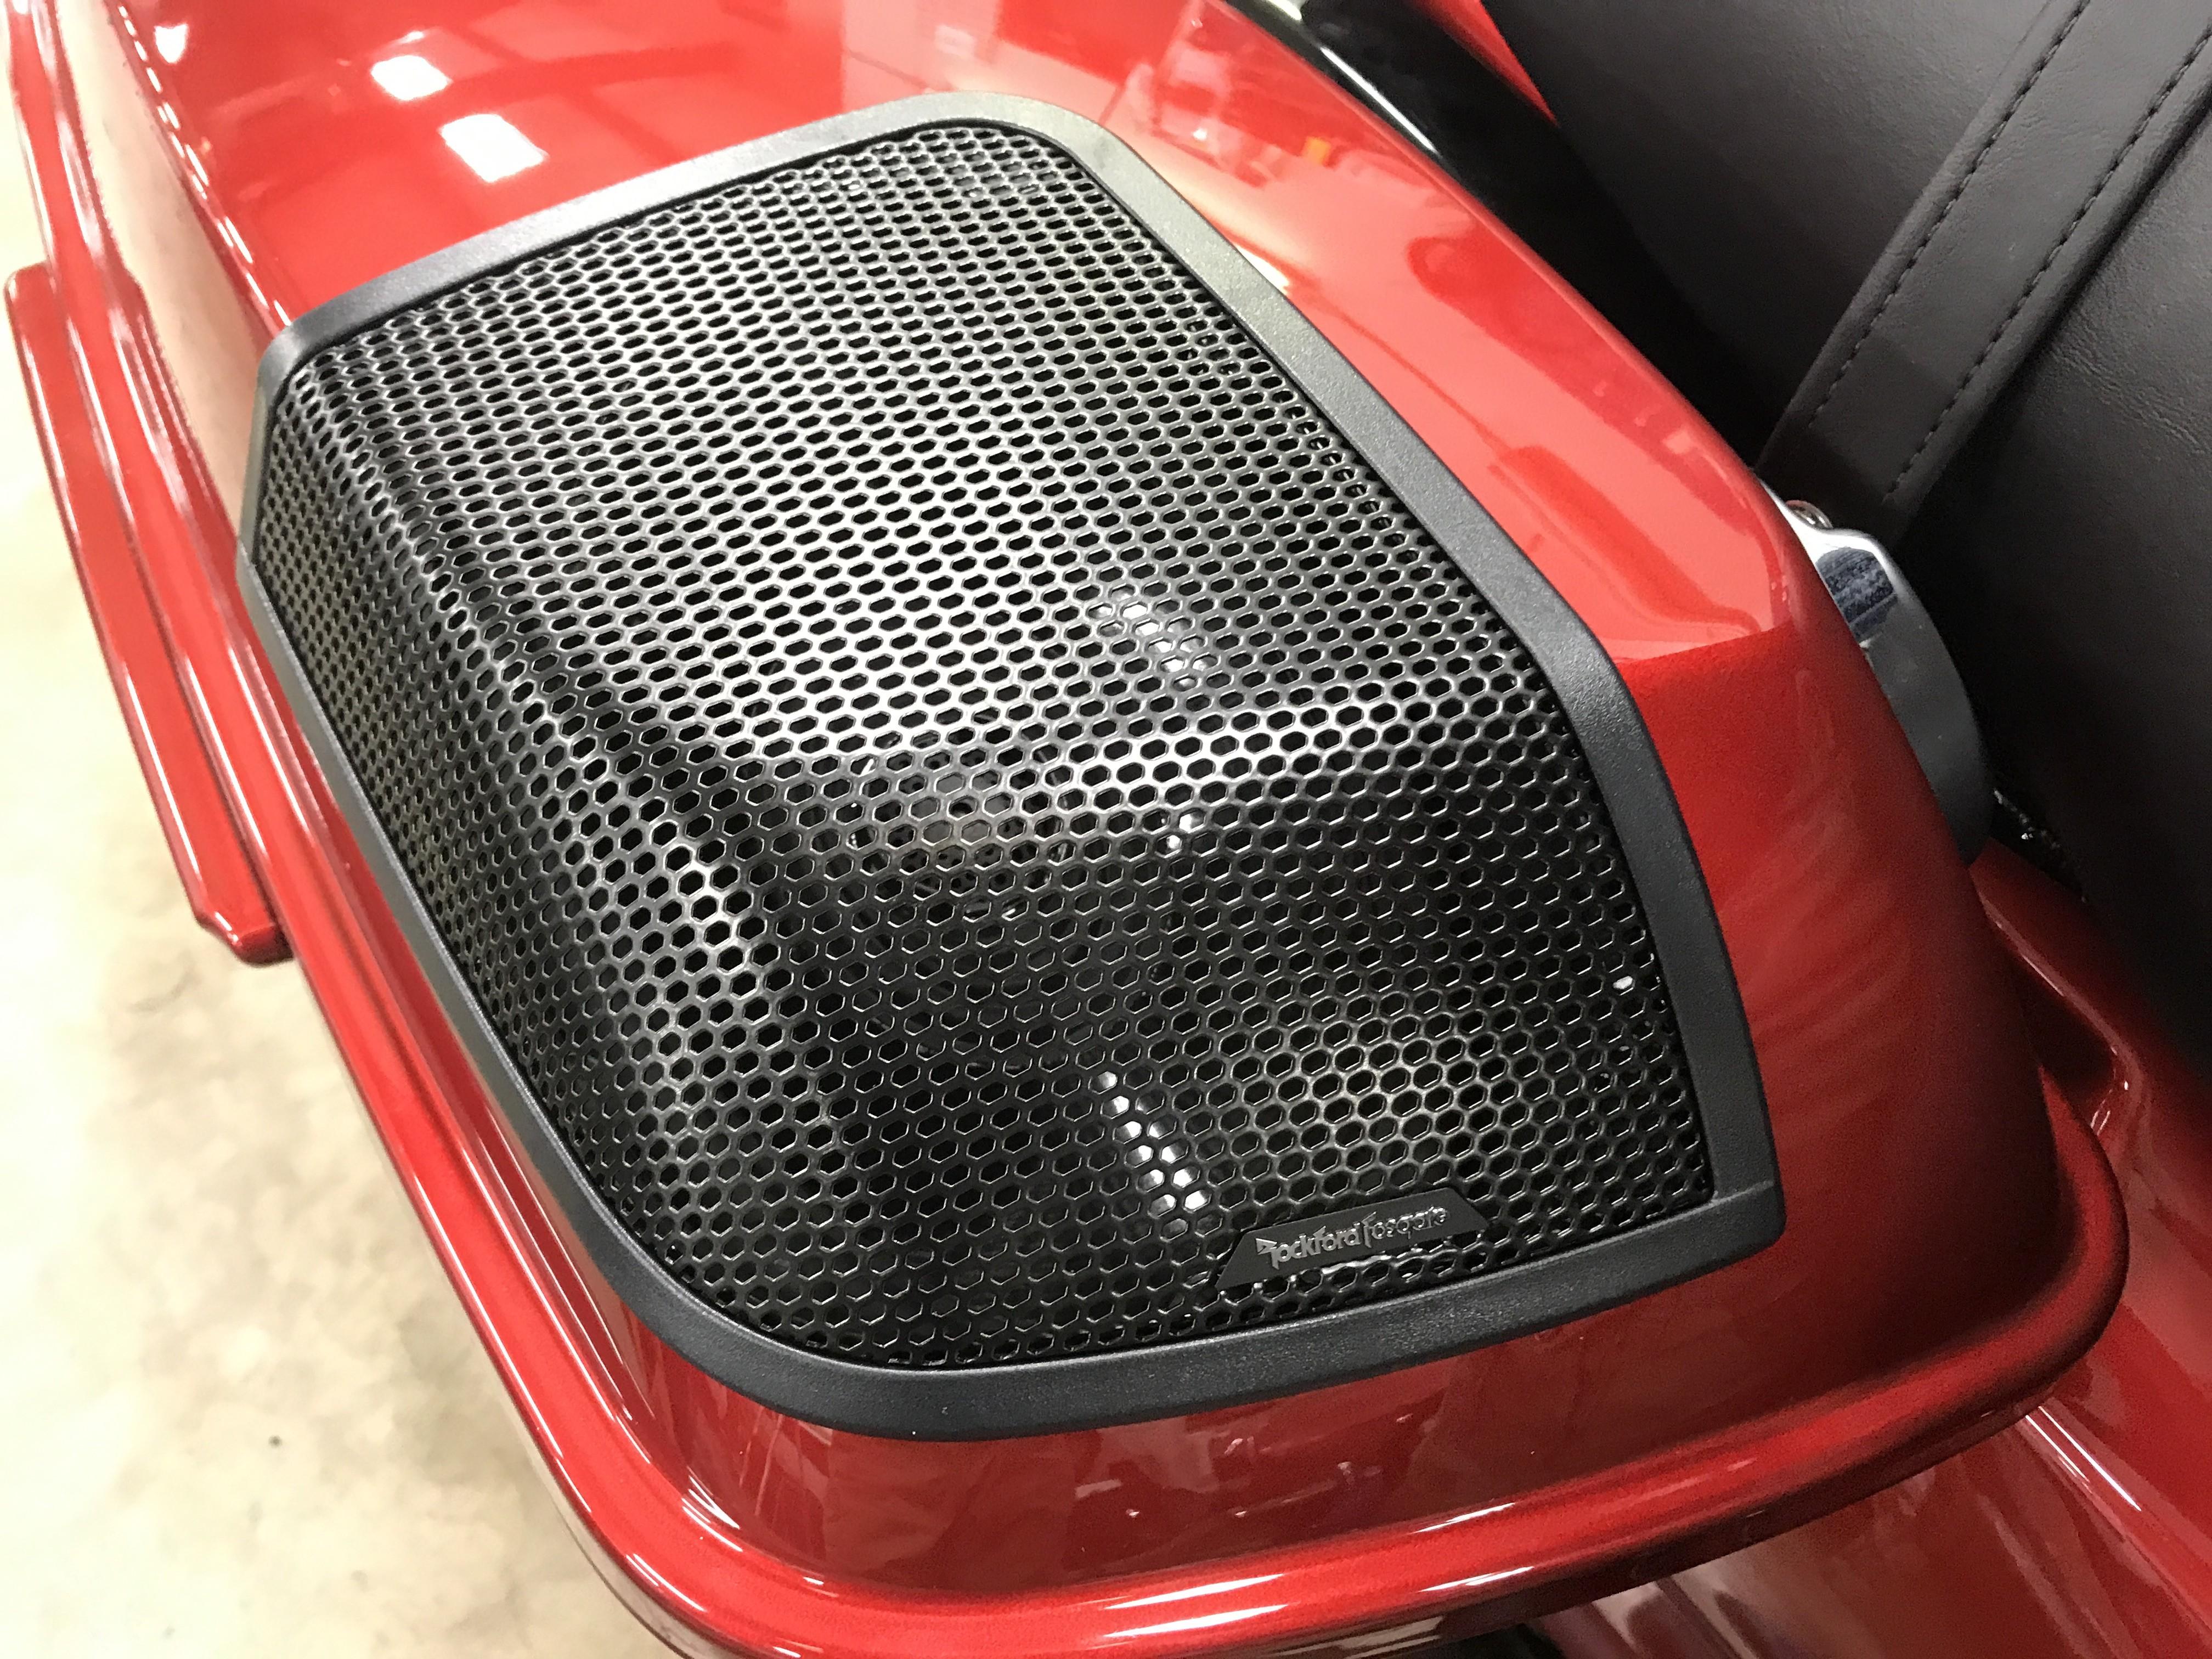 Rockford Fosgate Rear Speaker Kit Close